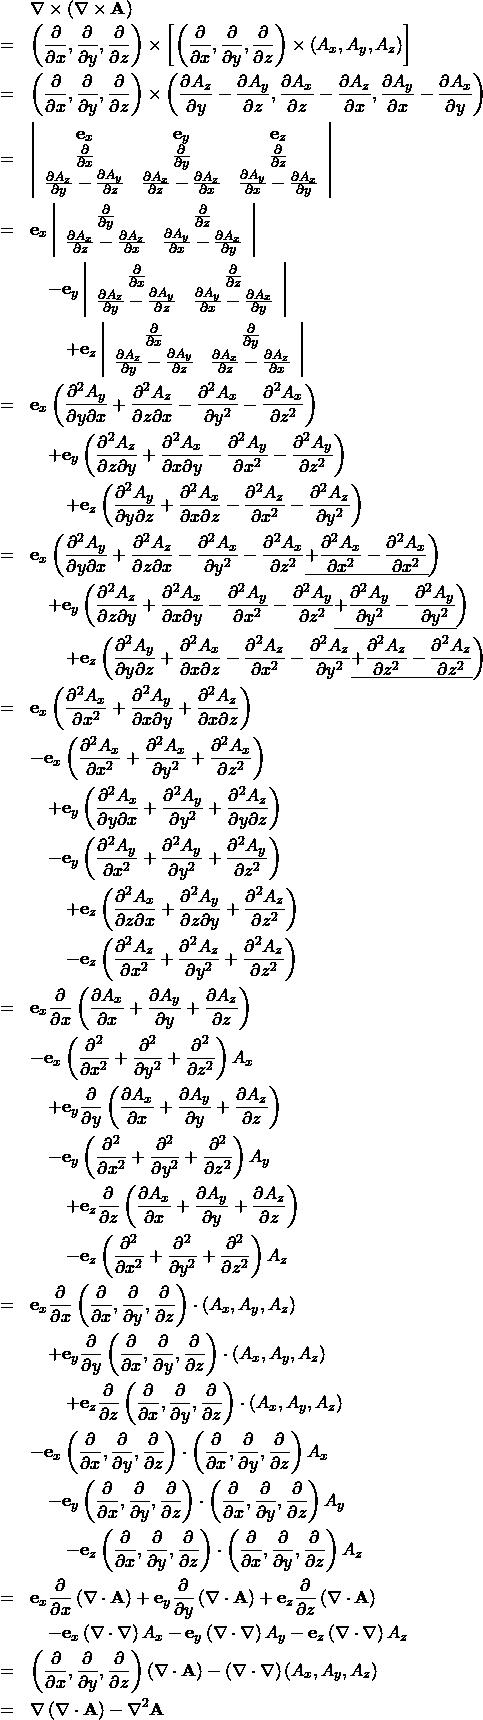 \begin{eqnarray*} && \nabla \times (\nabla \times {\bf A})  \\ &=&  \left( \frac{\partial}{\partial x }, \frac{\partial}{\partial y }, \frac{\partial}{\partial z } \right) \times \left[ \left( \frac{\partial}{\partial x }, \frac{\partial}{\partial y }, \frac{\partial}{\partial z } \right) \times \left( A_x , A_y , A_z \right) \right] \\ &=& \left( \frac{\partial }{\partial x }, \frac{\partial }{\partial y }, \frac{\partial}{\partial z } \right) \times  \left( \frac{\partial A_z}{\partial y } - \frac{\partial A_y }{\partial z },  \frac{\partial A_x }{\partial z } - \frac{\partial A_z}{\partial x },  \frac{\partial A_y}{\partial x } - \frac{\partial A_x}{\partial y } \right) \\ &=& \left| \begin{array}{ccc} {\bf e}_x & {\bf e}_y & {\bf e}_z\\ \frac{\partial }{\partial x }& \frac{\partial }{\partial y }& \frac{\partial}{\partial z }\\ \frac{\partial A_z}{\partial y } - \frac{\partial A_y }{\partial z }&  \frac{\partial A_x }{\partial z } - \frac{\partial A_z}{\partial x }&  \frac{\partial A_y}{\partial x } - \frac{\partial A_x}{\partial y }  \end{array} \right| \\ &=& {\bf e}_x \left| \begin{array}{cc} \frac{\partial }{\partial y }& \frac{\partial}{\partial z }\\  \frac{\partial A_x }{\partial z } - \frac{\partial A_z}{\partial x }&  \frac{\partial A_y}{\partial x } - \frac{\partial A_x}{\partial y }  \end{array} \right| \\ && \quad - {\bf e}_y \left| \begin{array}{cc} \frac{\partial }{\partial x }& \frac{\partial}{\partial z }\\ \frac{\partial A_z}{\partial y } - \frac{\partial A_y }{\partial z }&  \frac{\partial A_y}{\partial x } - \frac{\partial A_x}{\partial y }  \end{array} \right| \\ && \qquad + {\bf e}_z \left| \begin{array}{cc} \frac{\partial }{\partial x }& \frac{\partial}{\partial y } \\ \frac{\partial A_z}{\partial y } - \frac{\partial A_y }{\partial z }&  \frac{\partial A_x }{\partial z } - \frac{\partial A_z}{\partial x } \end{array} \right|\\ &=& {\bf e}_x \left(\frac{\partial^2 A_y}{\partial y \partial x } + \frac{\partial^2 A_z}{\partial z \partial x } 